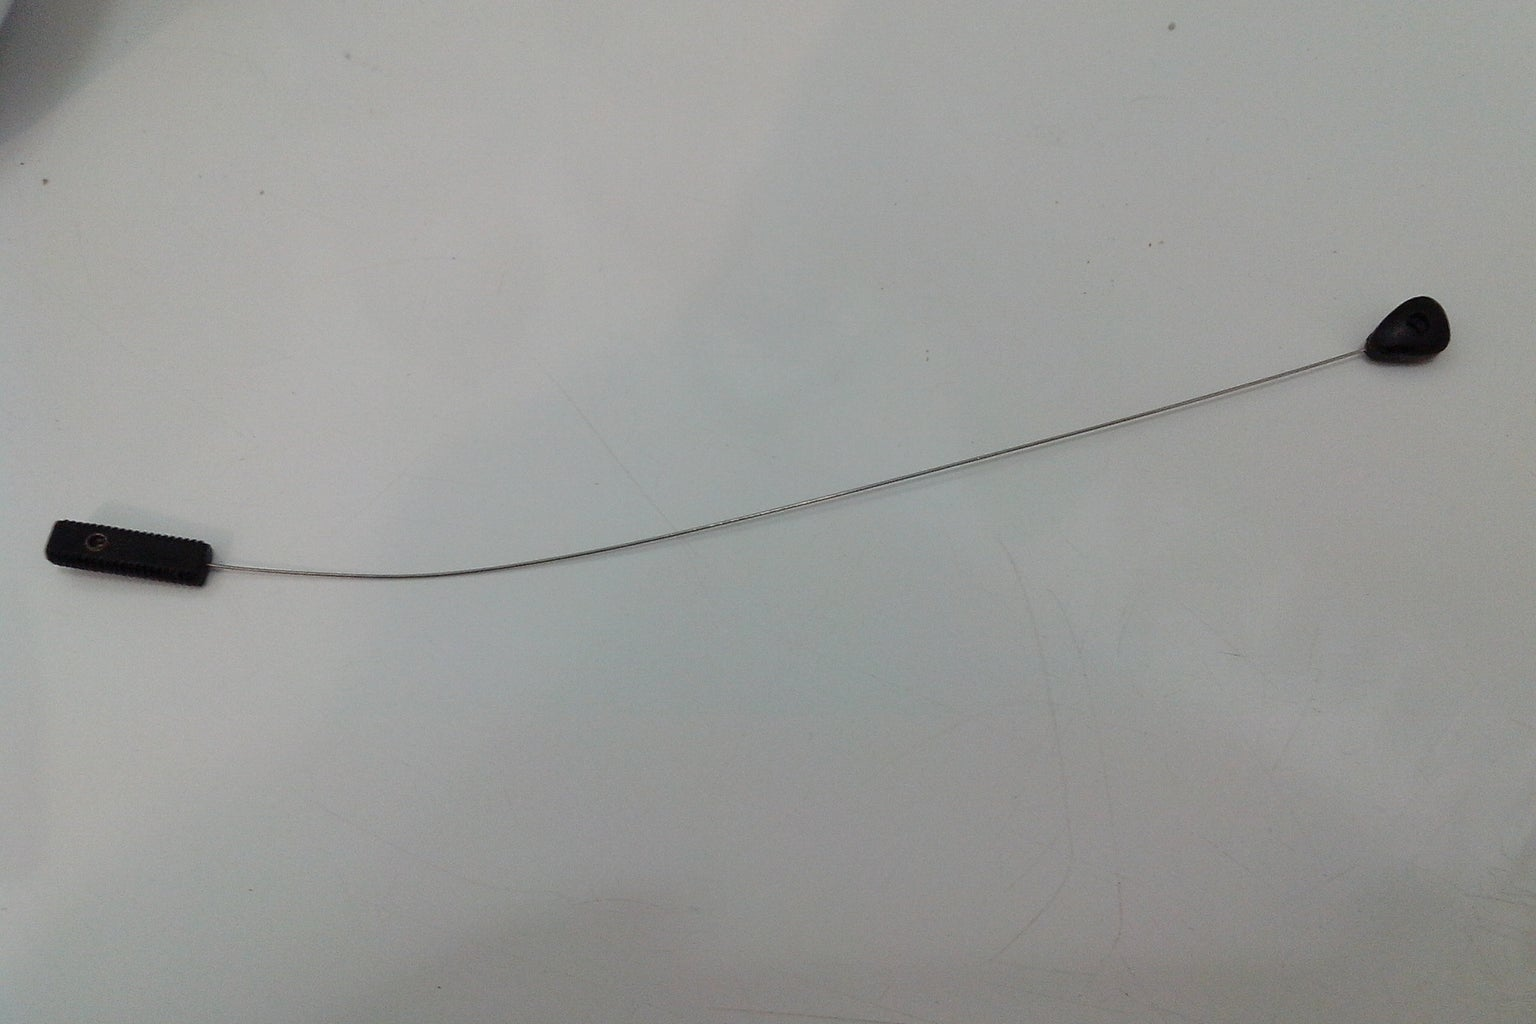 Attach Wire